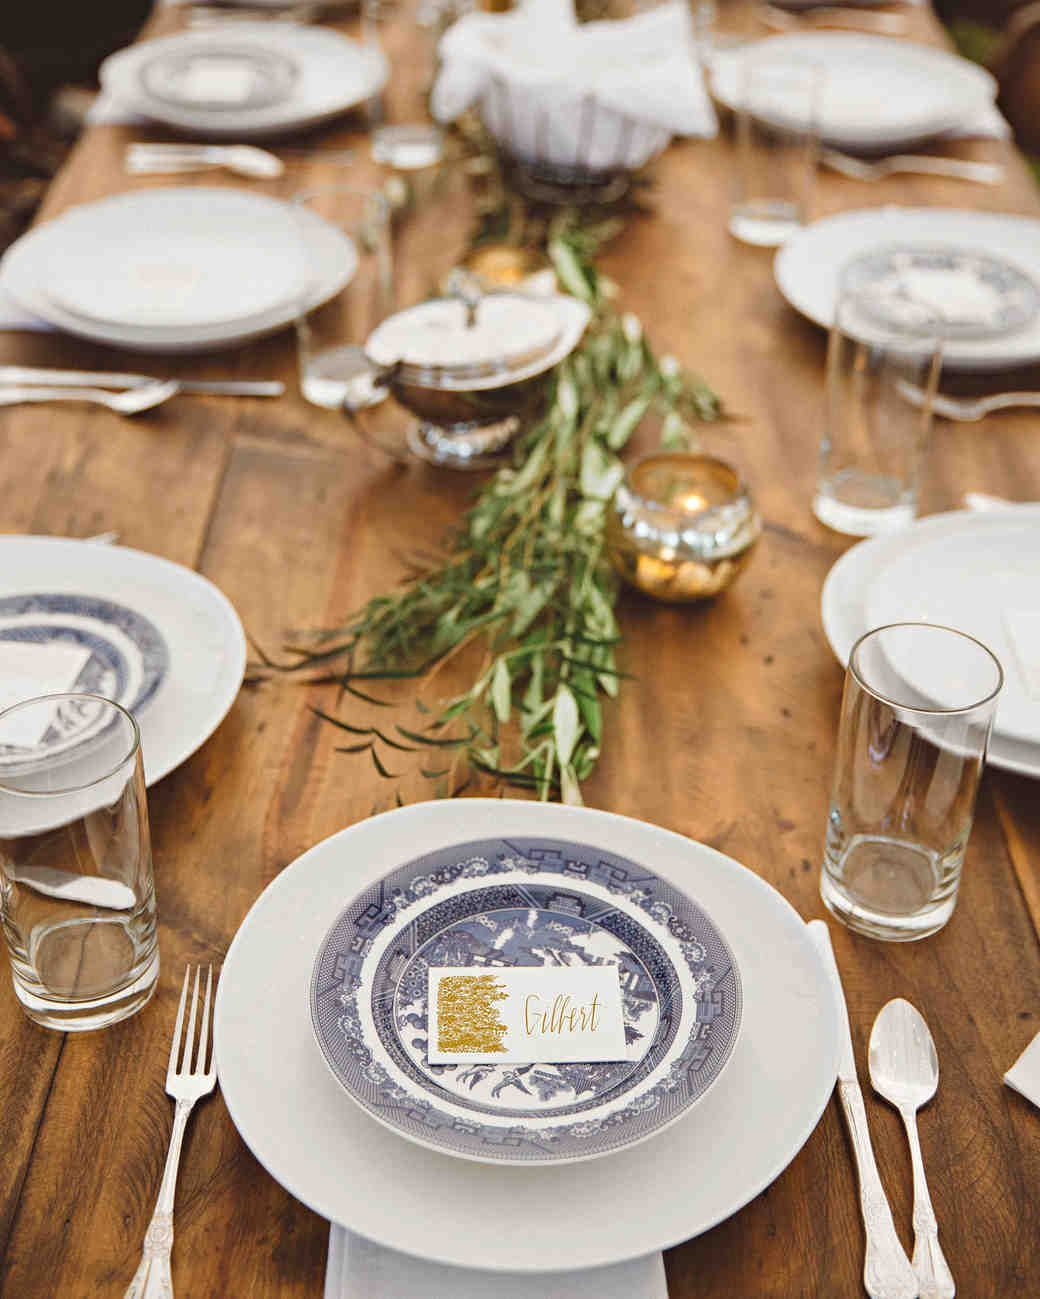 A Diy Wedding With A Ceremony In A Pool Wedding Floral Centerpieces Rustic Wedding Centerpieces Non Floral Centerpieces